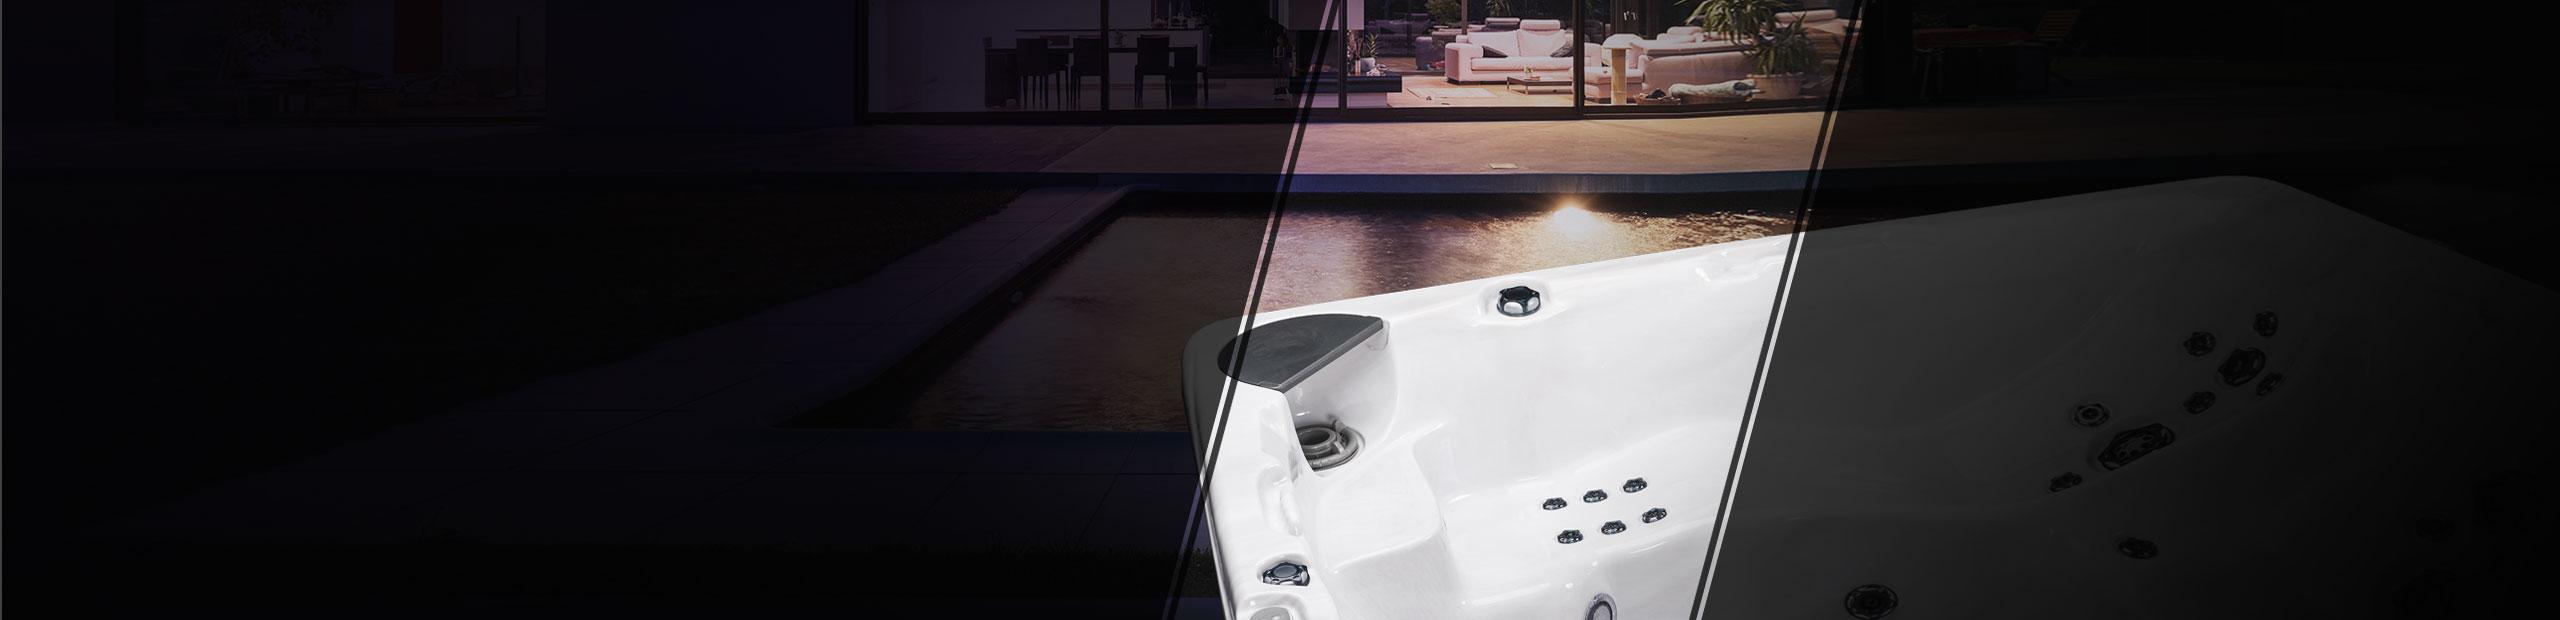 BC Home Leisure Langley Hot Tub 700 Series